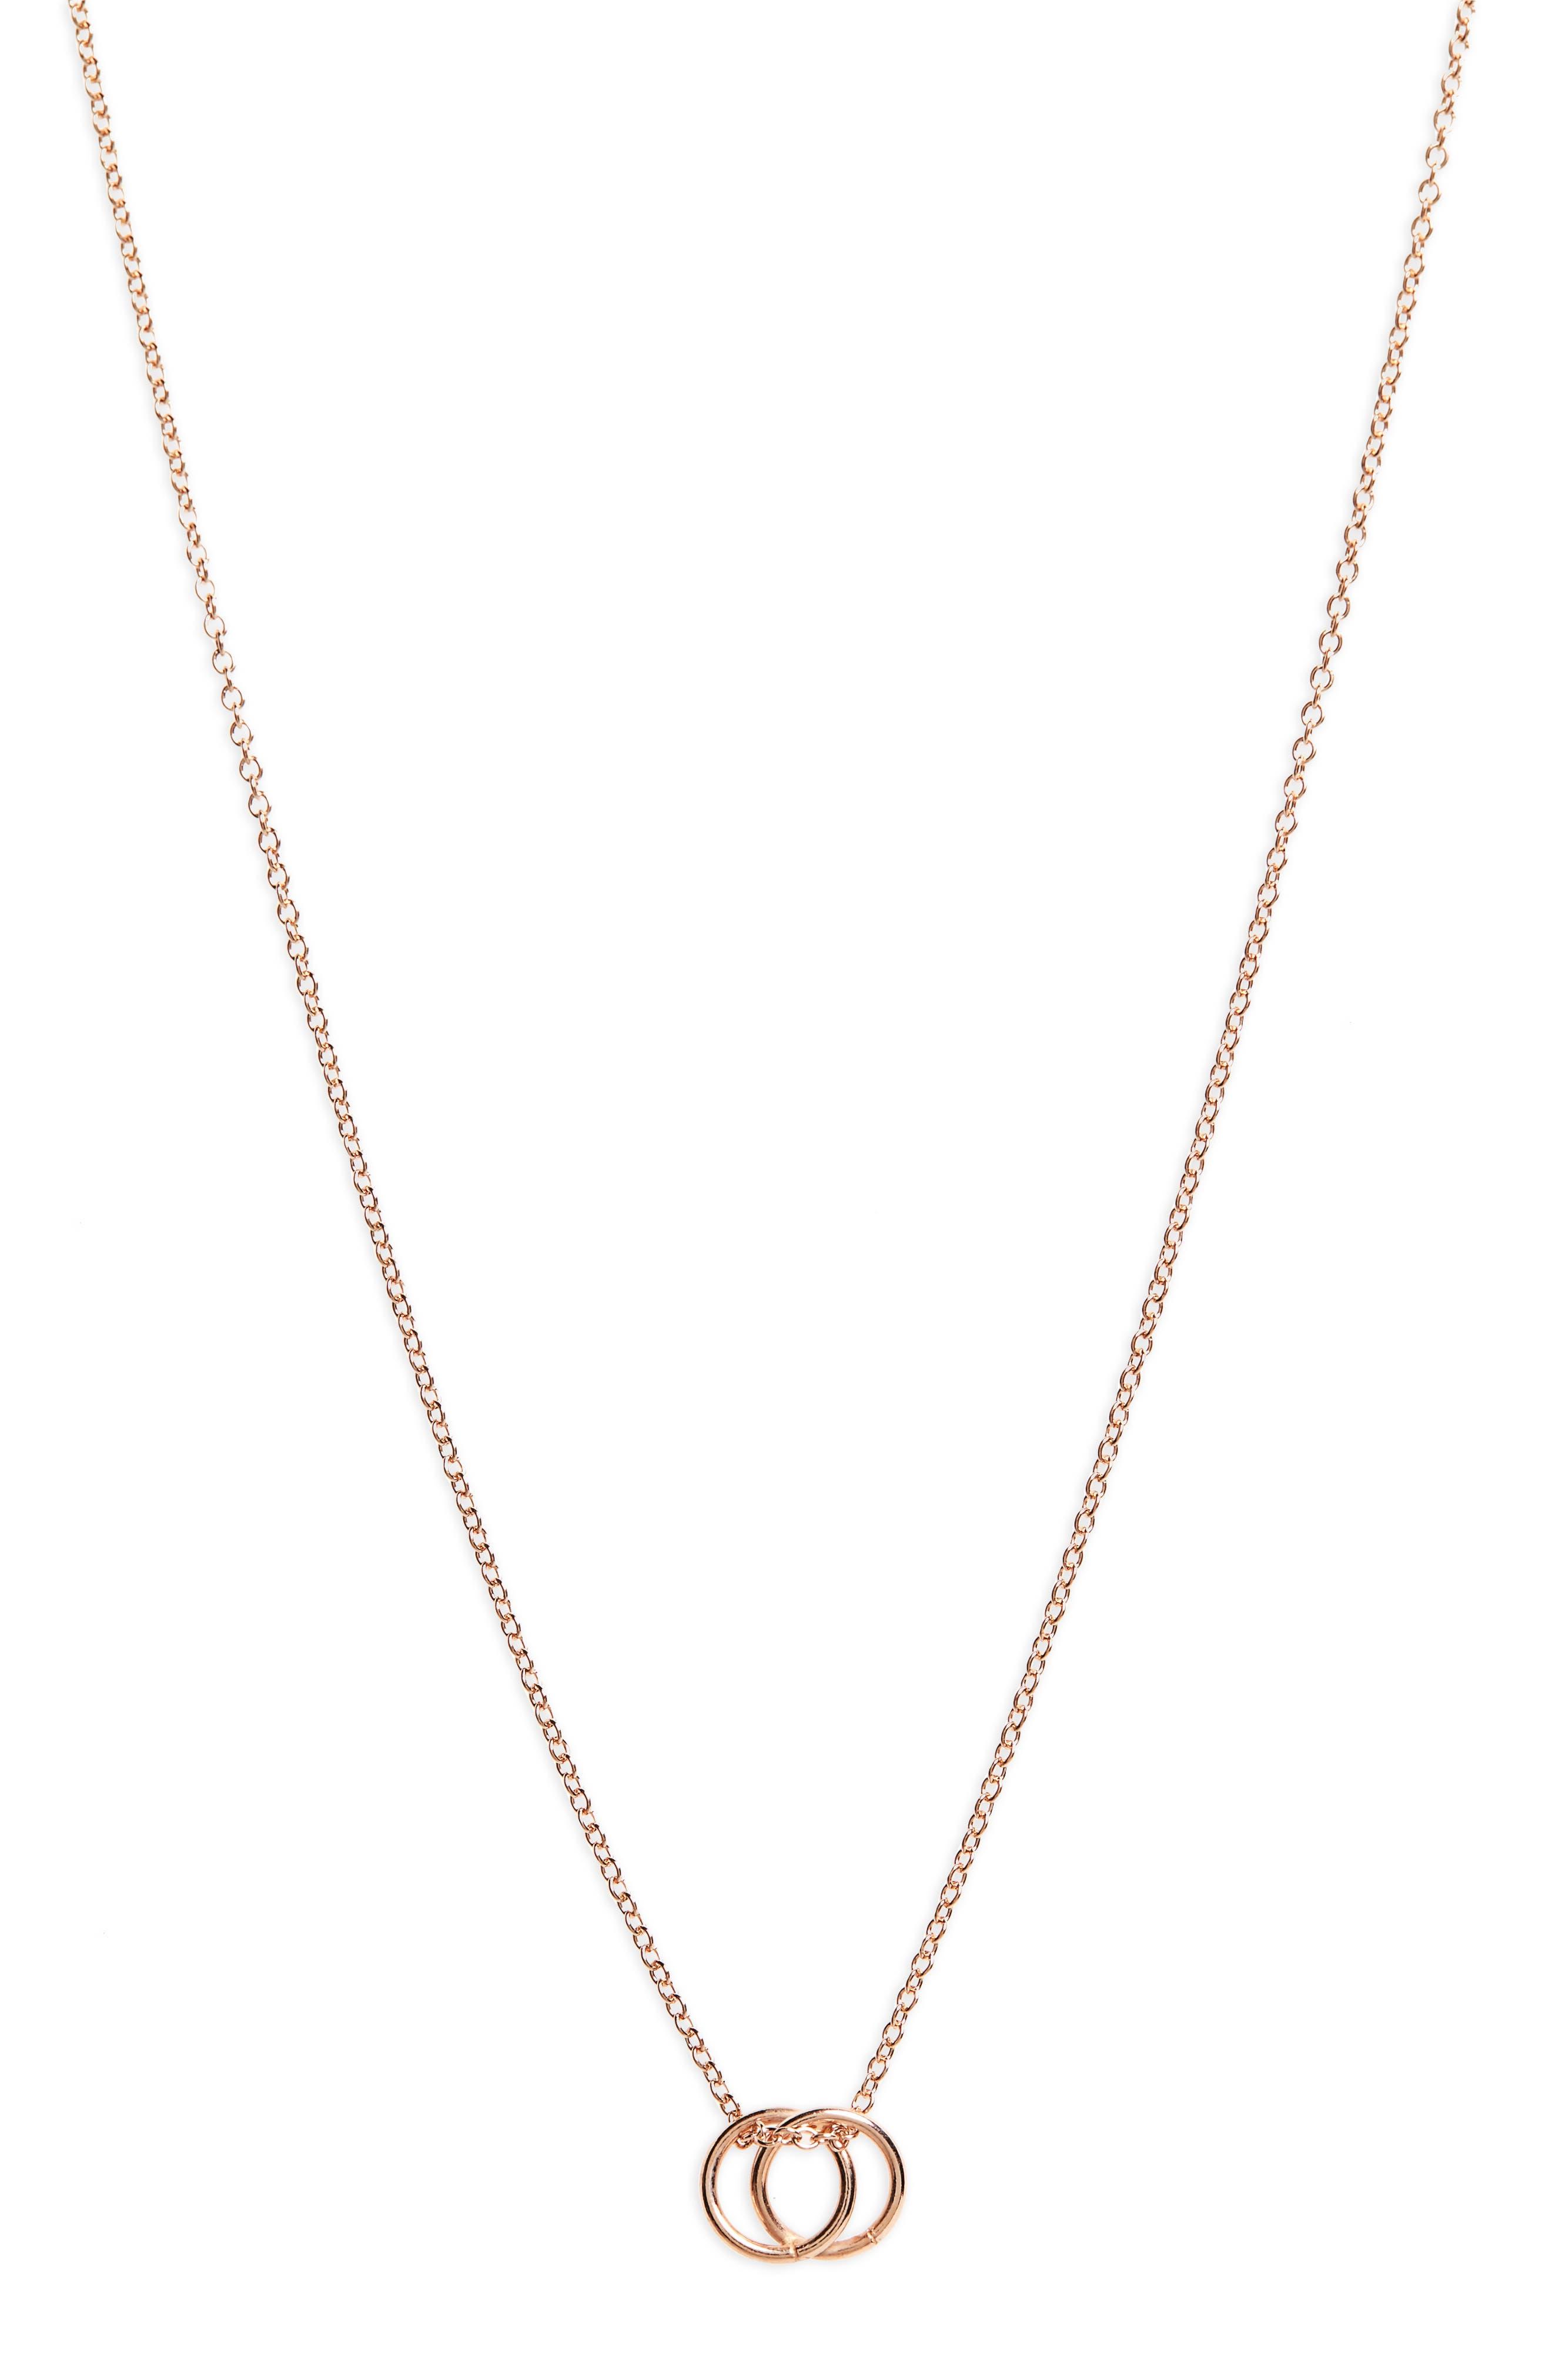 Main Image - Dogeared Karma Linked Ring Pendant Necklace